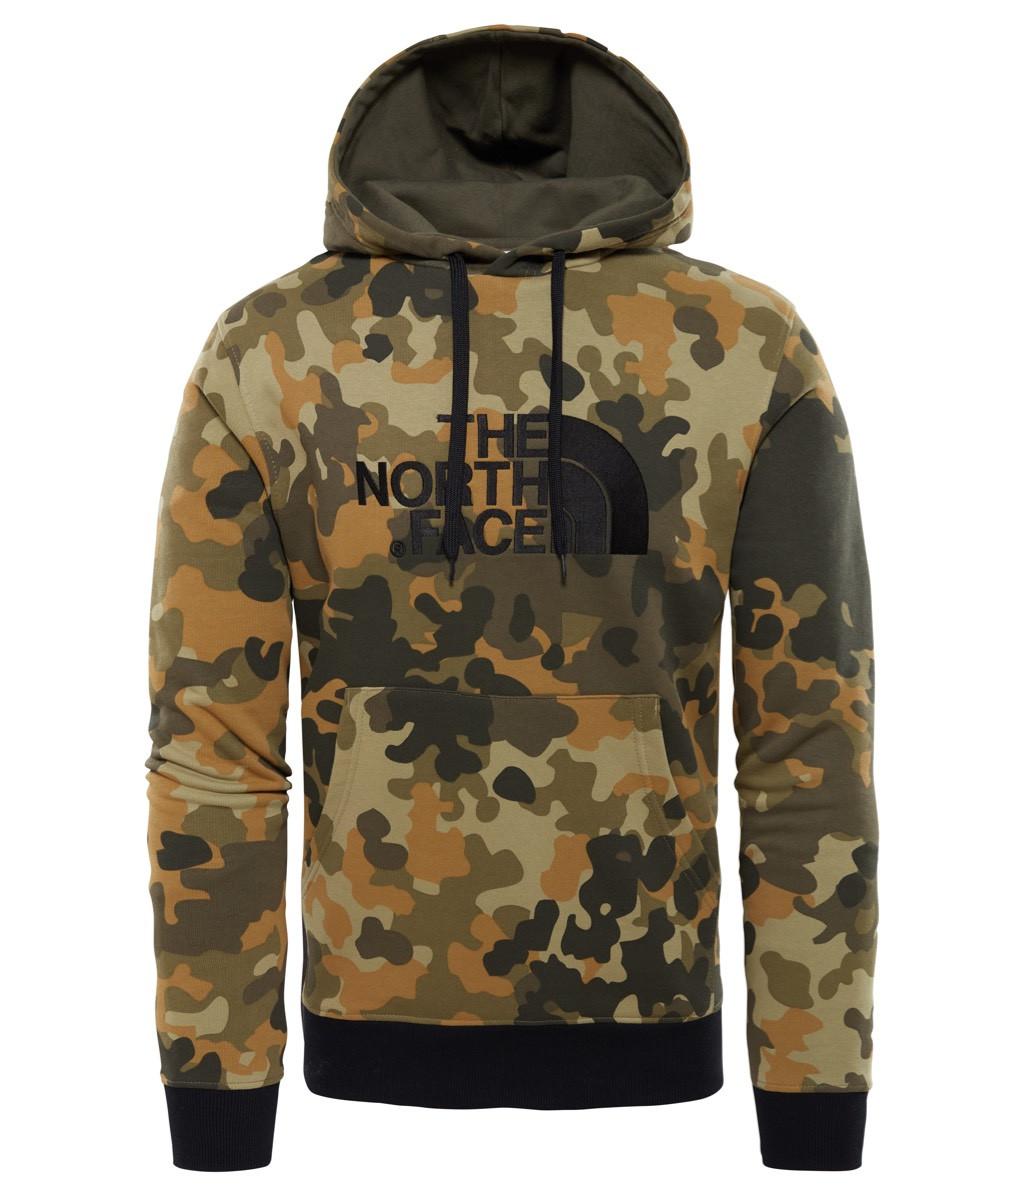 c03d0e68 ... The North Face Men's Drew Peak Pullover Hoodie-Eu New Taupe Green  Macrofleck Pr ...